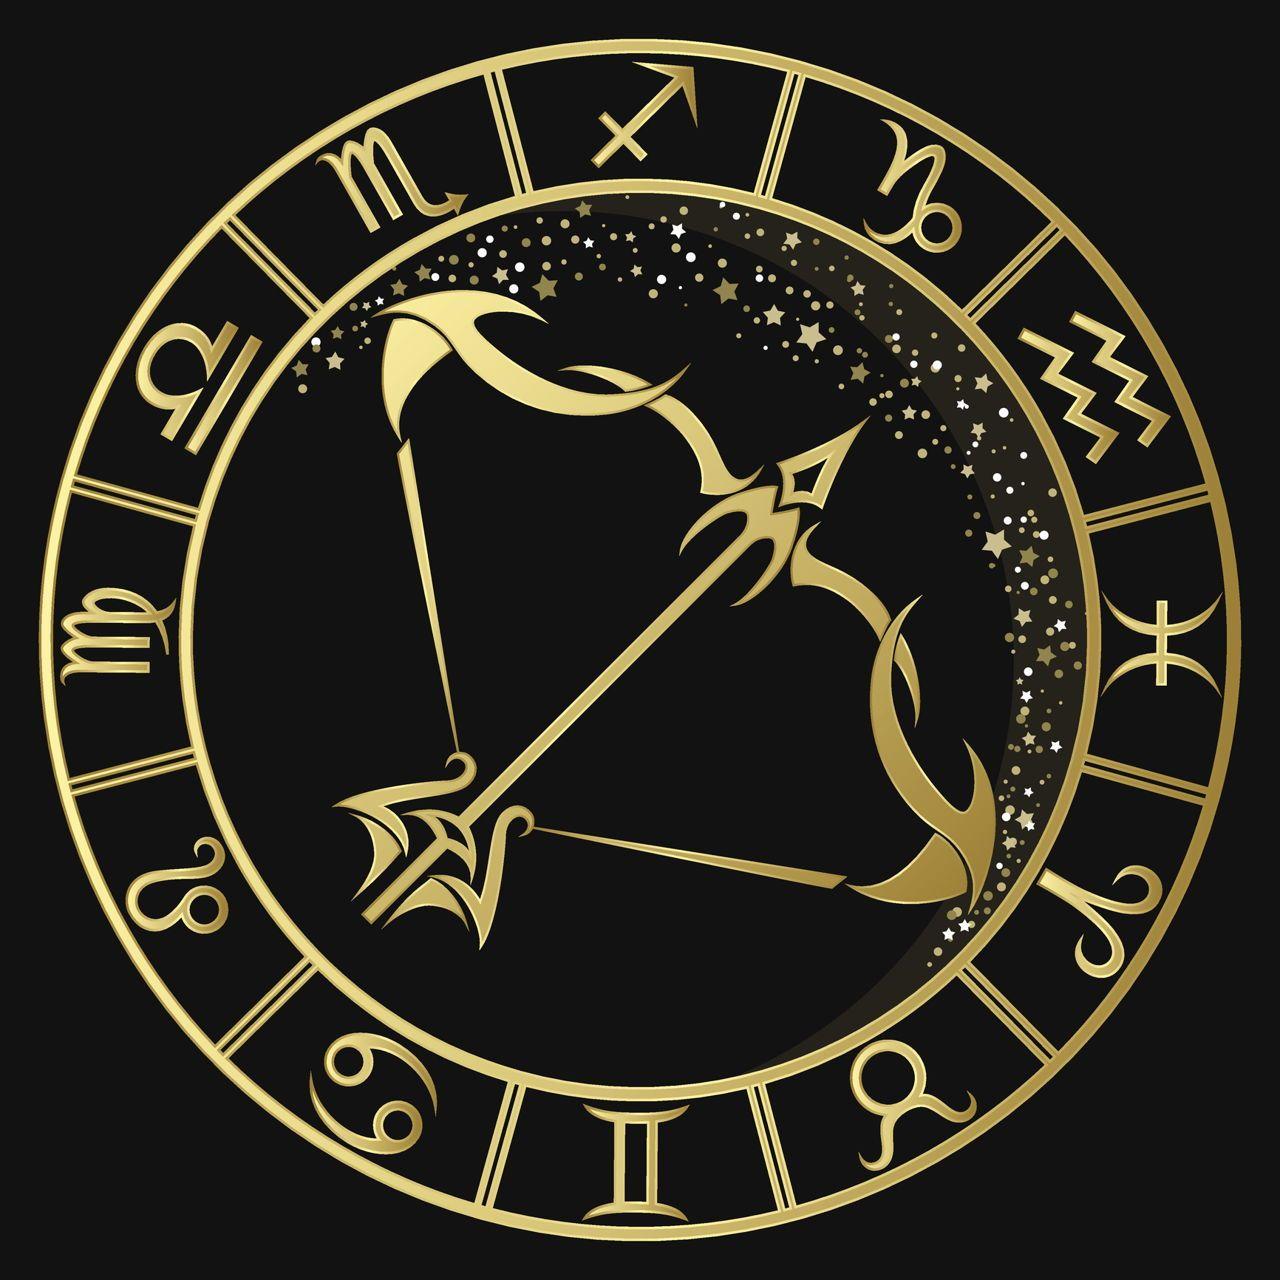 Golden Sagittarius Zodiac Sign Sagittarius Zodiac Sagittarius Zodiac Signs